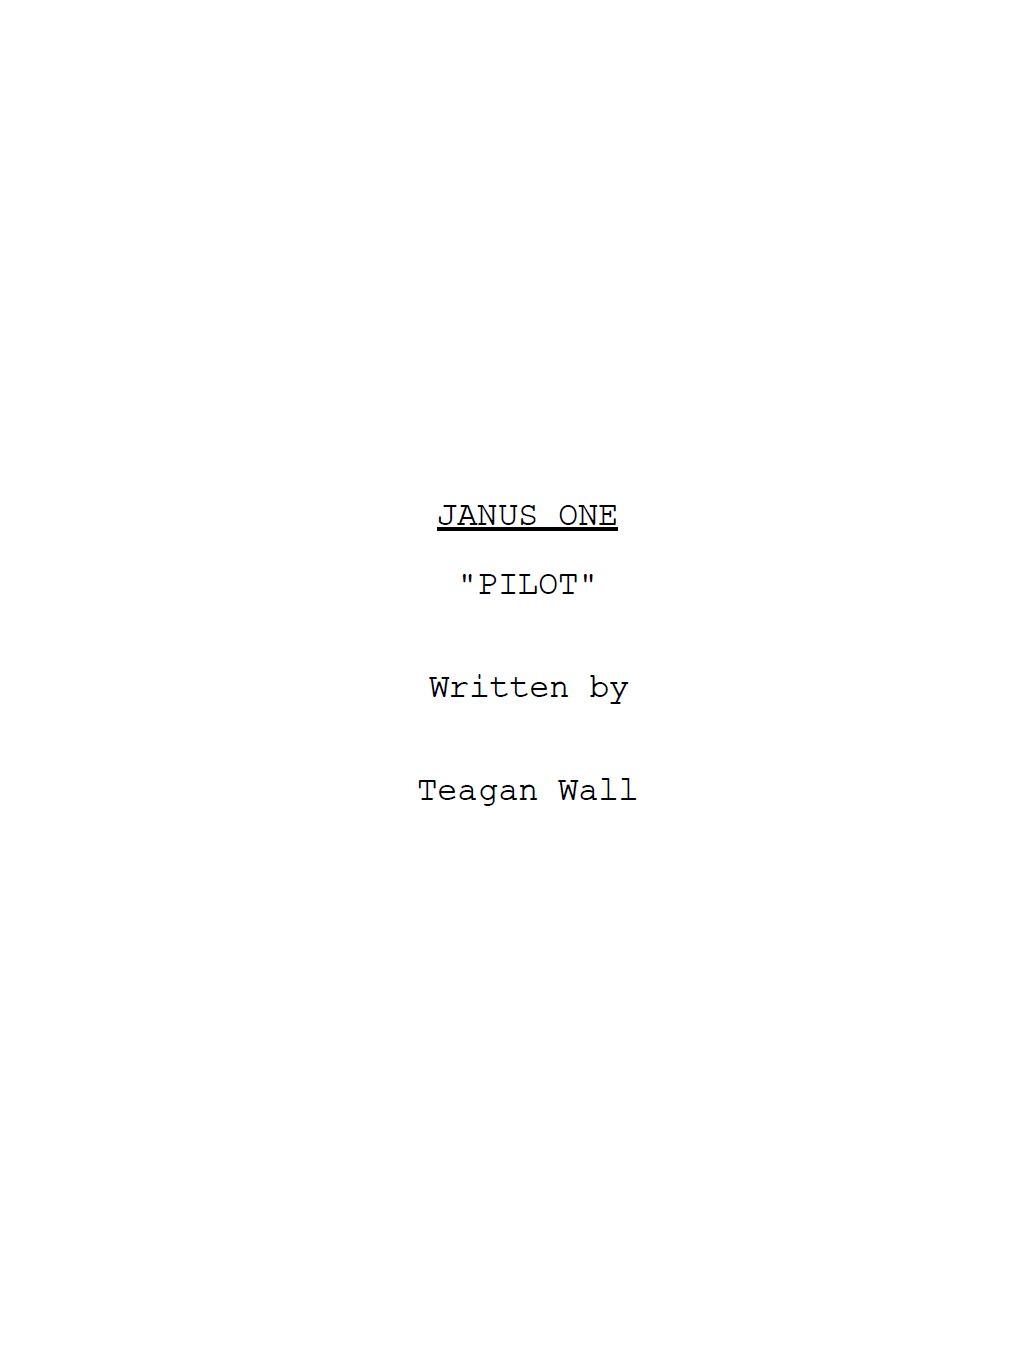 Janus one title page.JPG